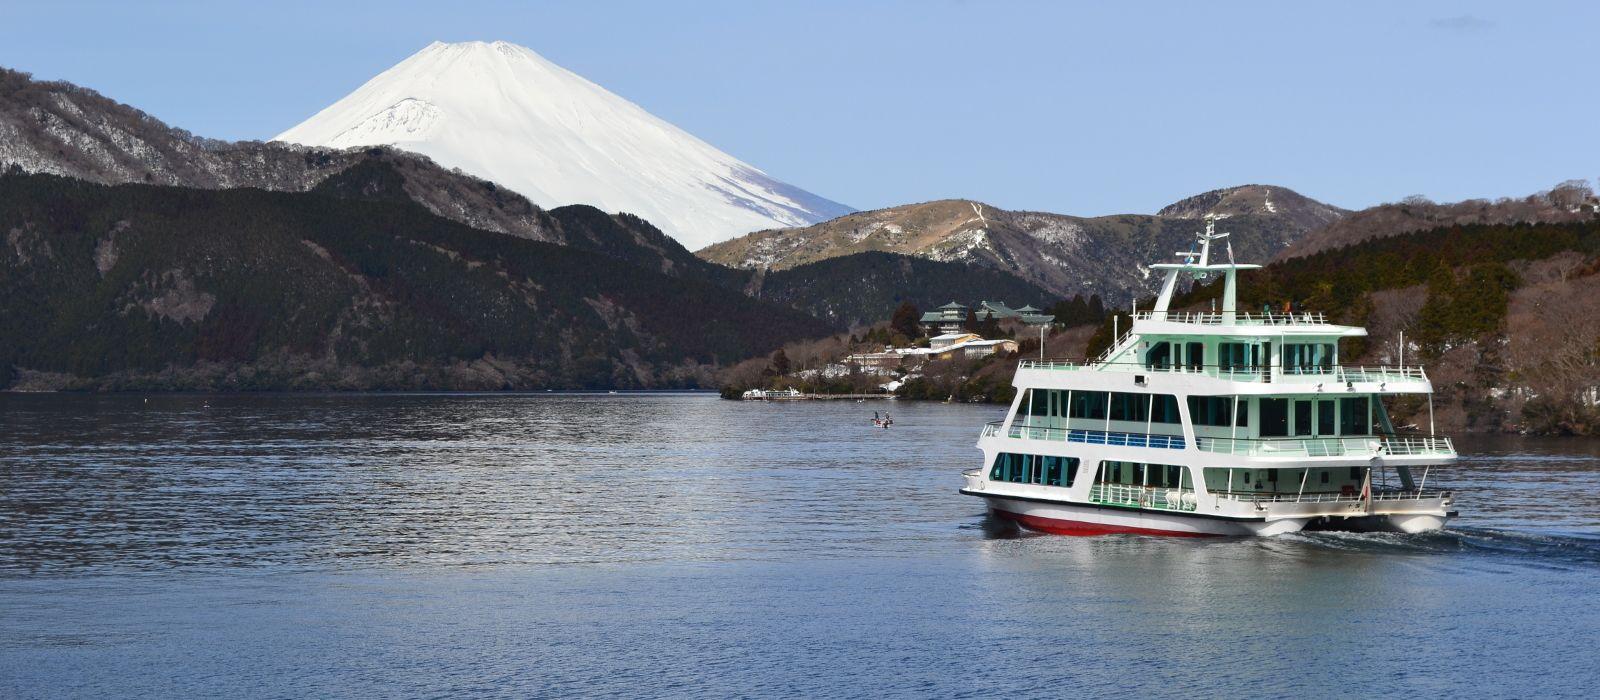 Destination Hakone Japan